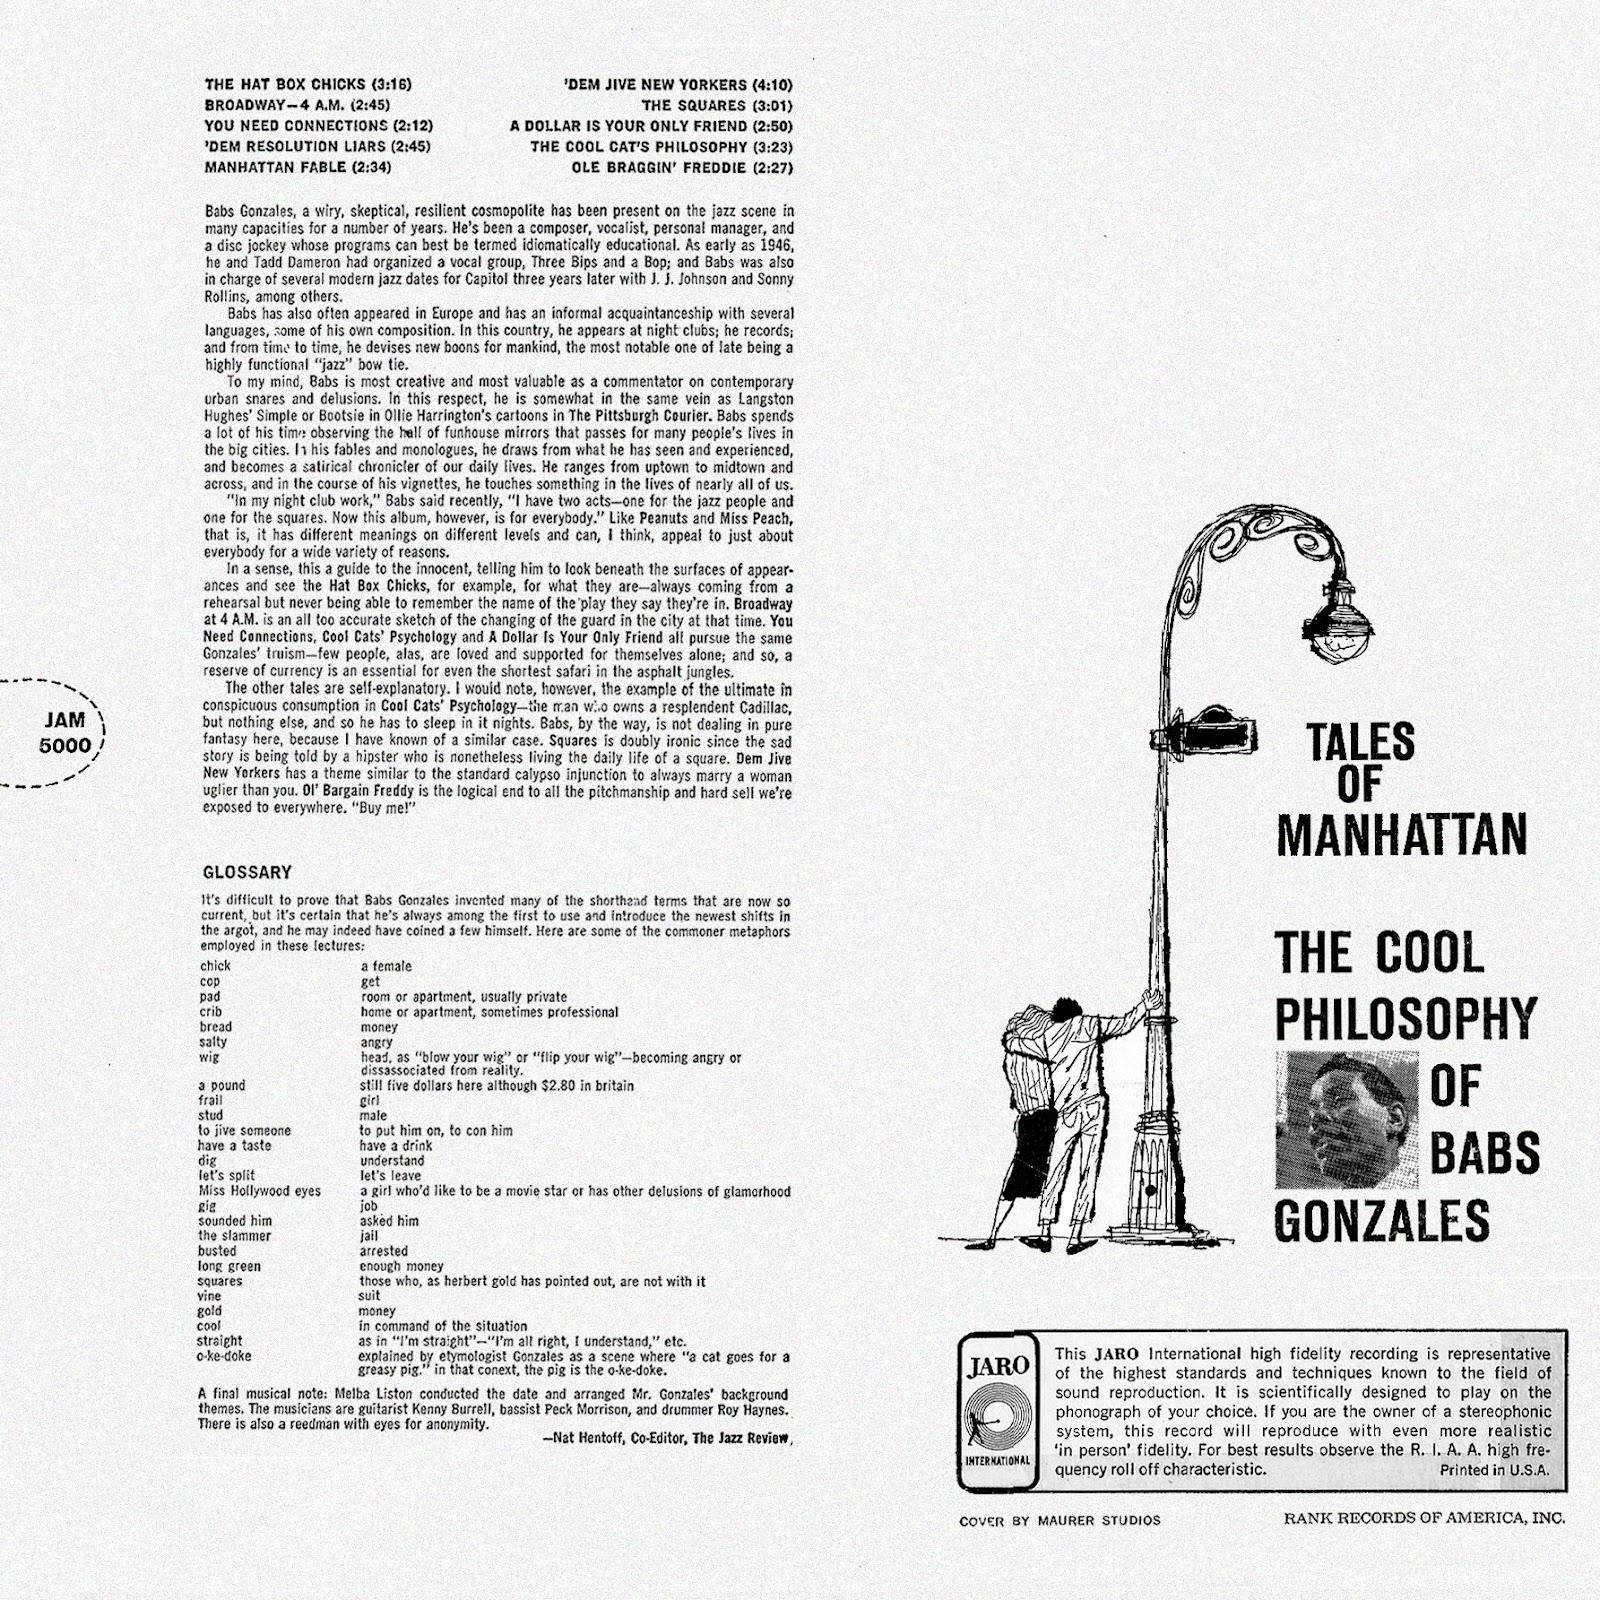 Babs+Gonzales+-+Tales+Of+Manhattan,+Cool+Philosophy+Of+Babs+Gonzales+Back.jpg